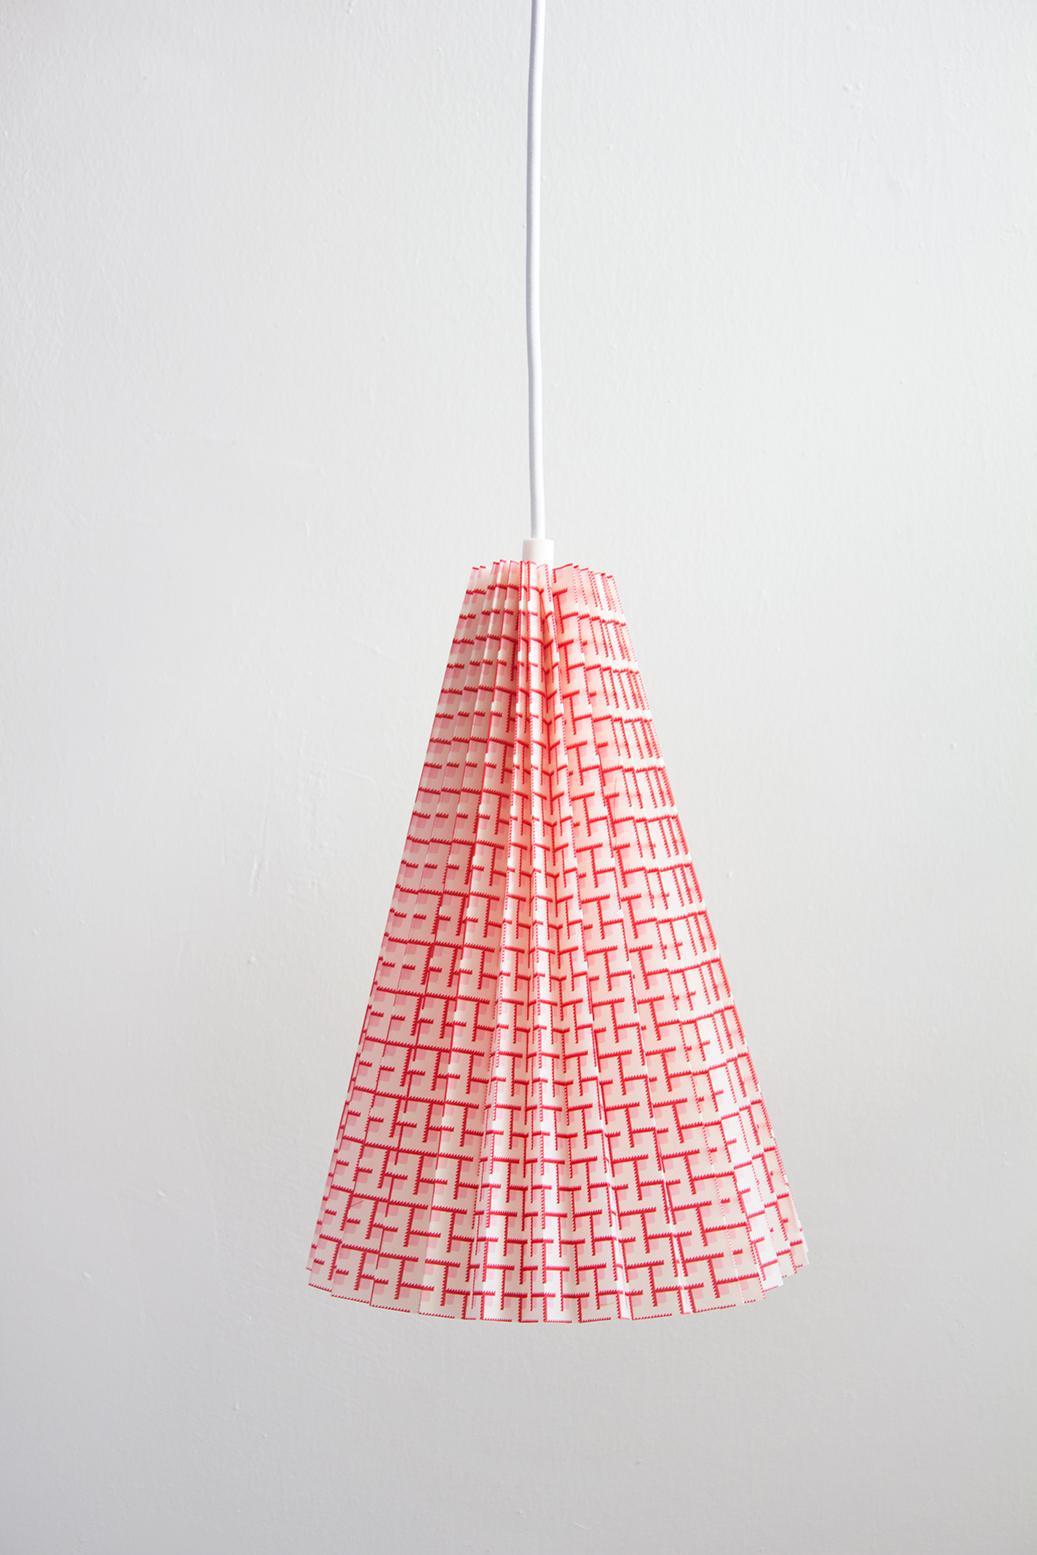 Corrie_Hogg_DIY_fabric_lamp_7